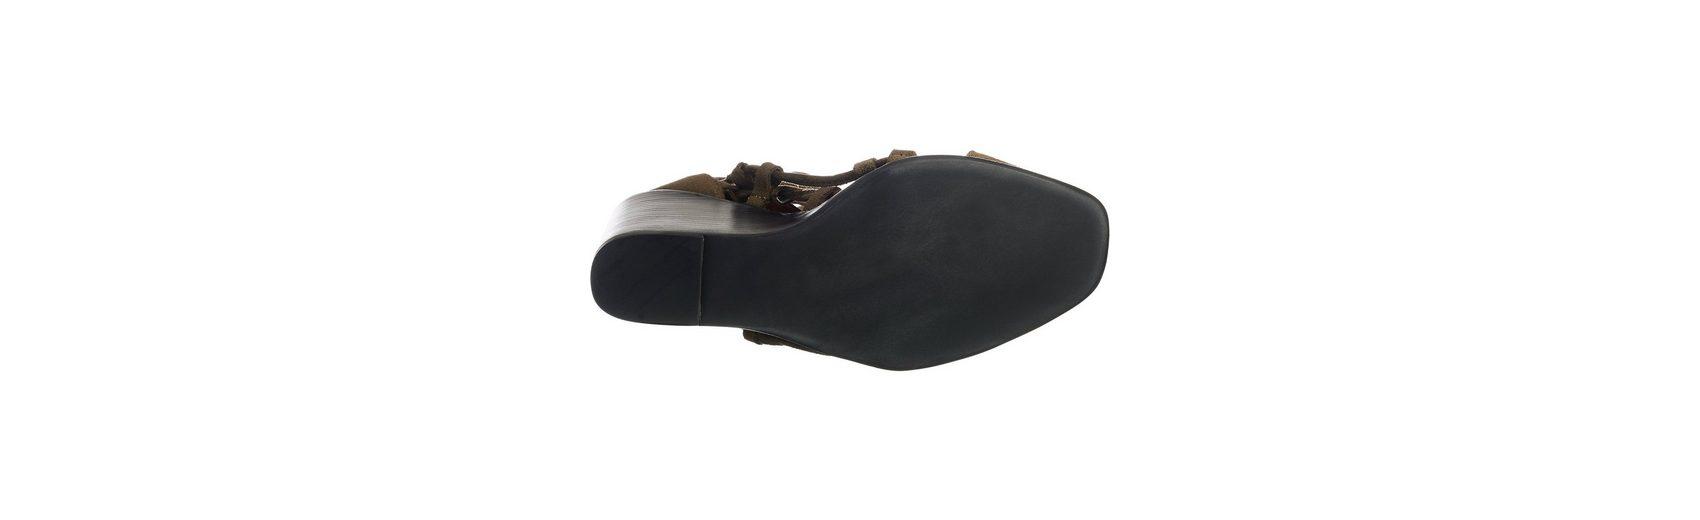 Billig Verkauf Browse Jeffrey Campbell Zaferiah Sandaletten Top Qualität Jw79oK